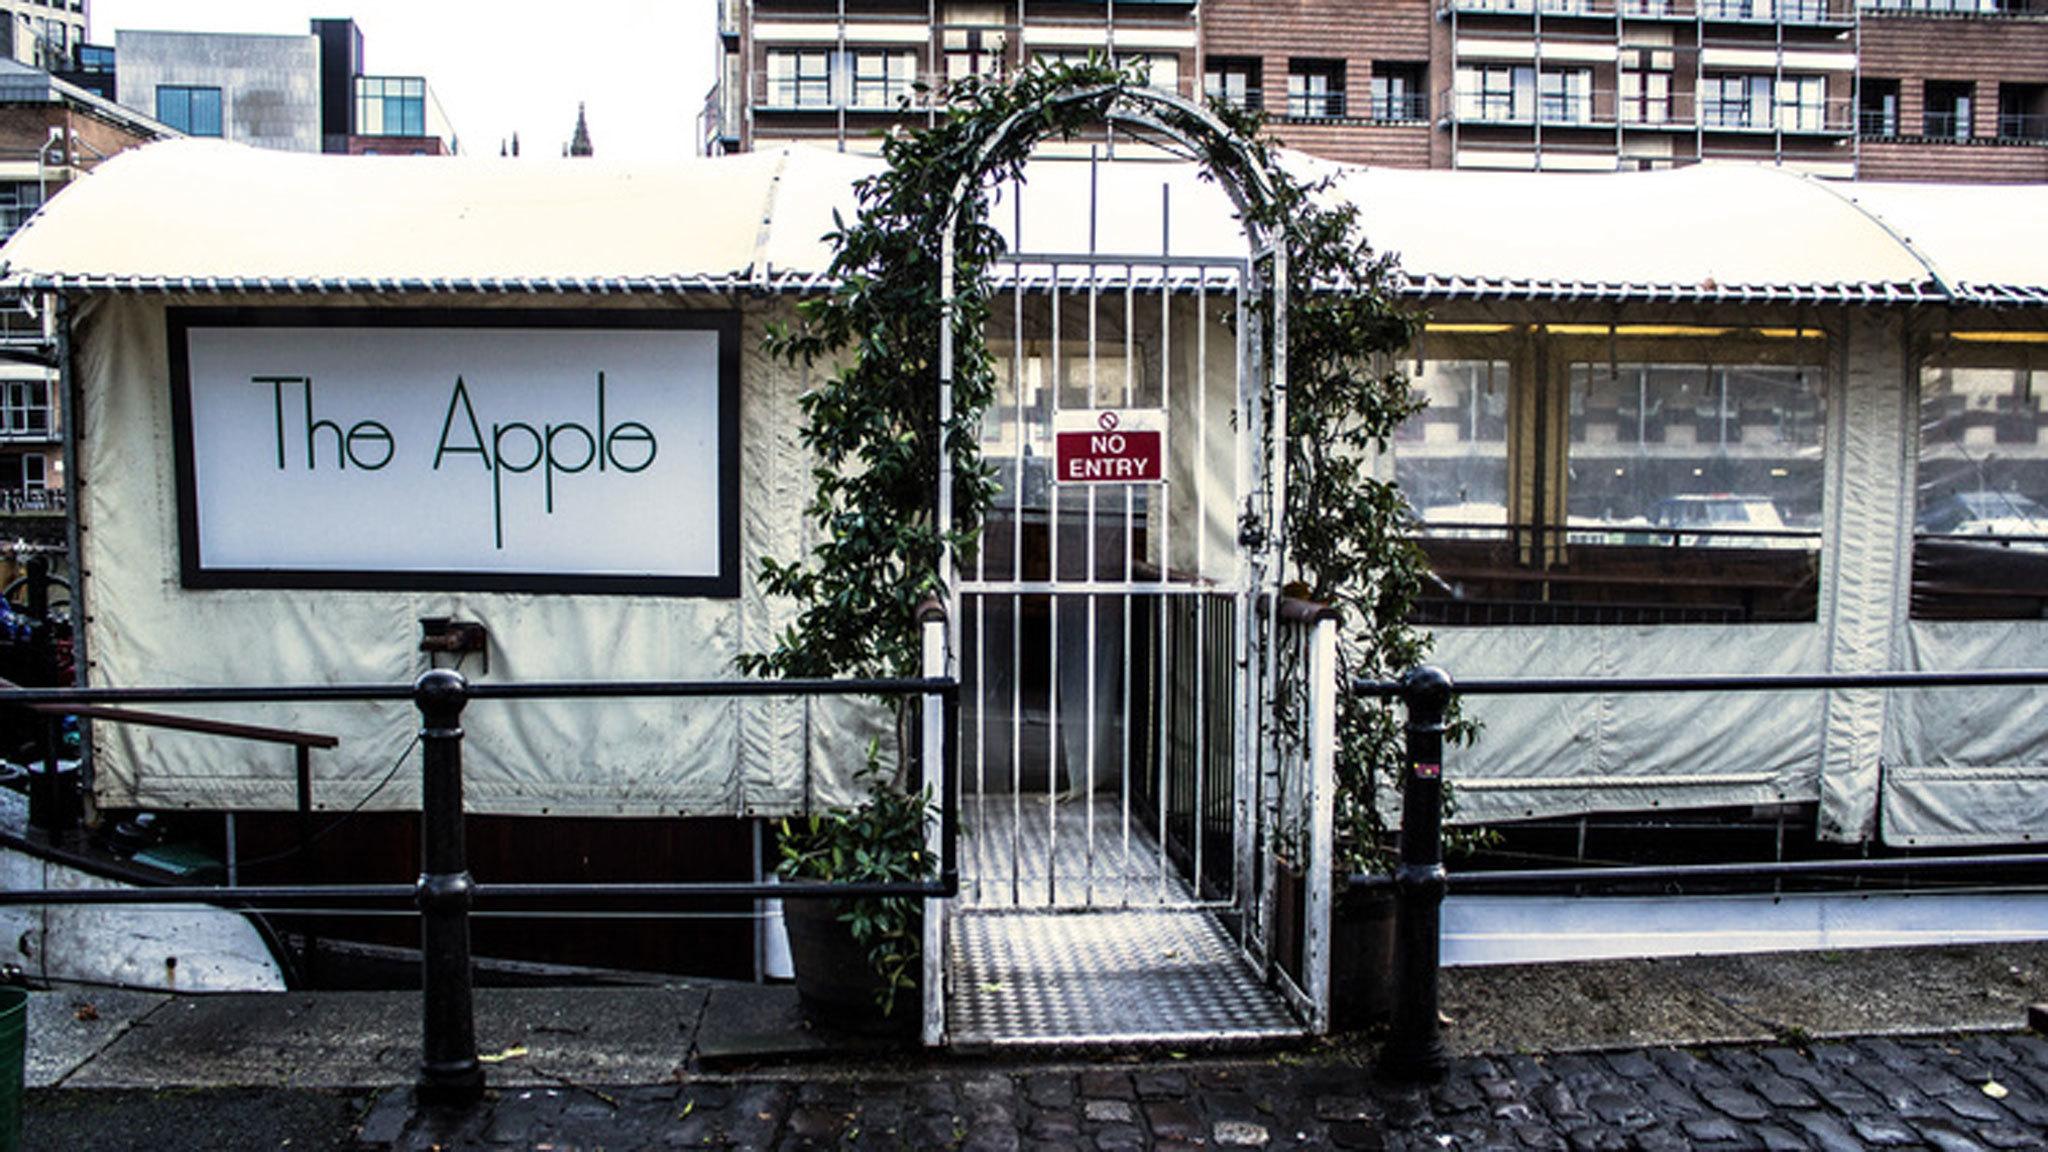 The Apple Bristol